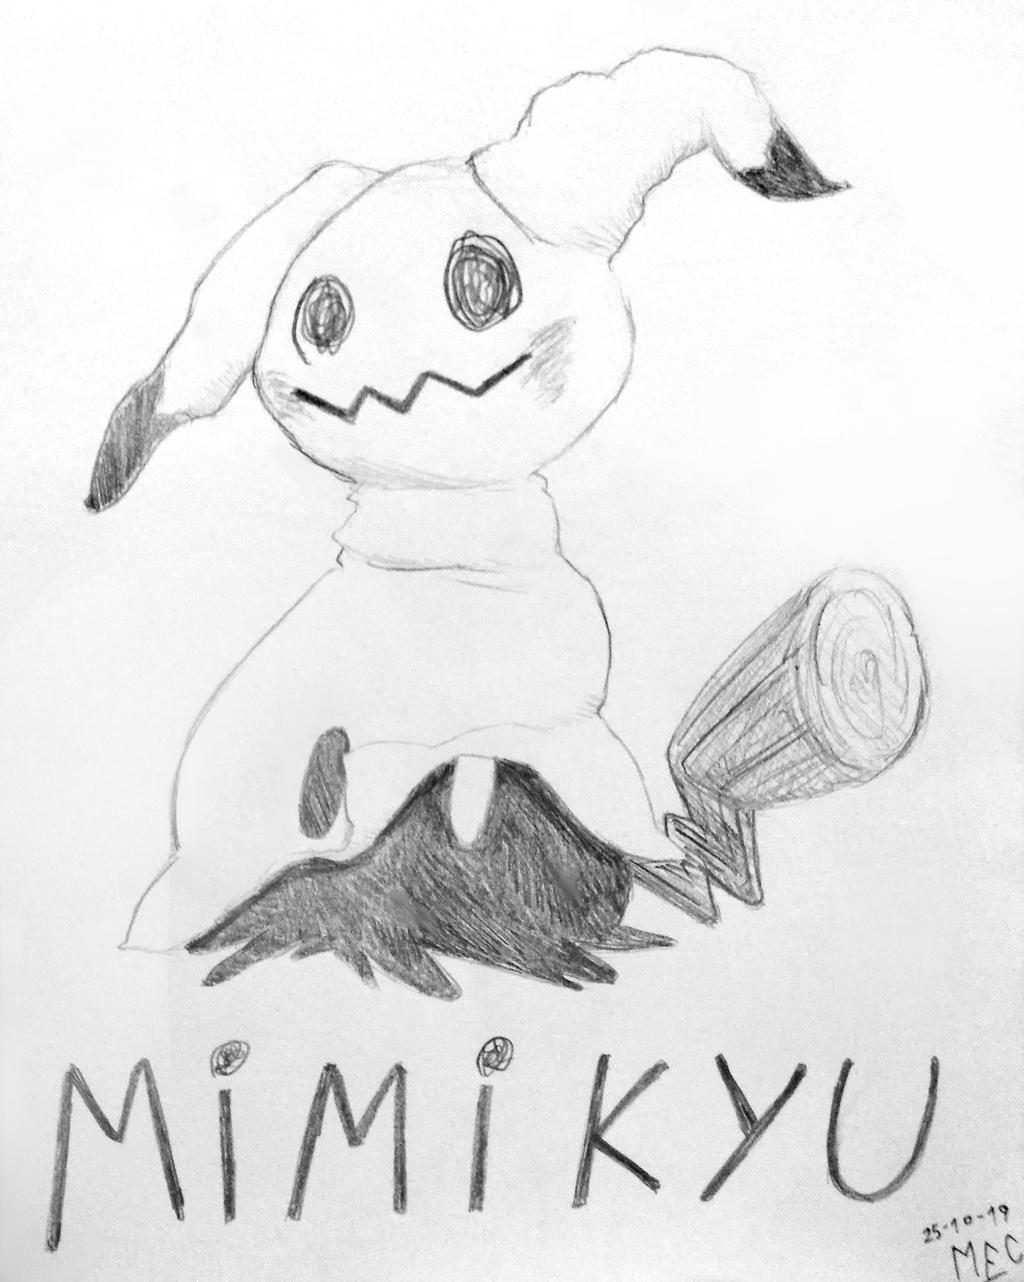 Mimikyu Sketch